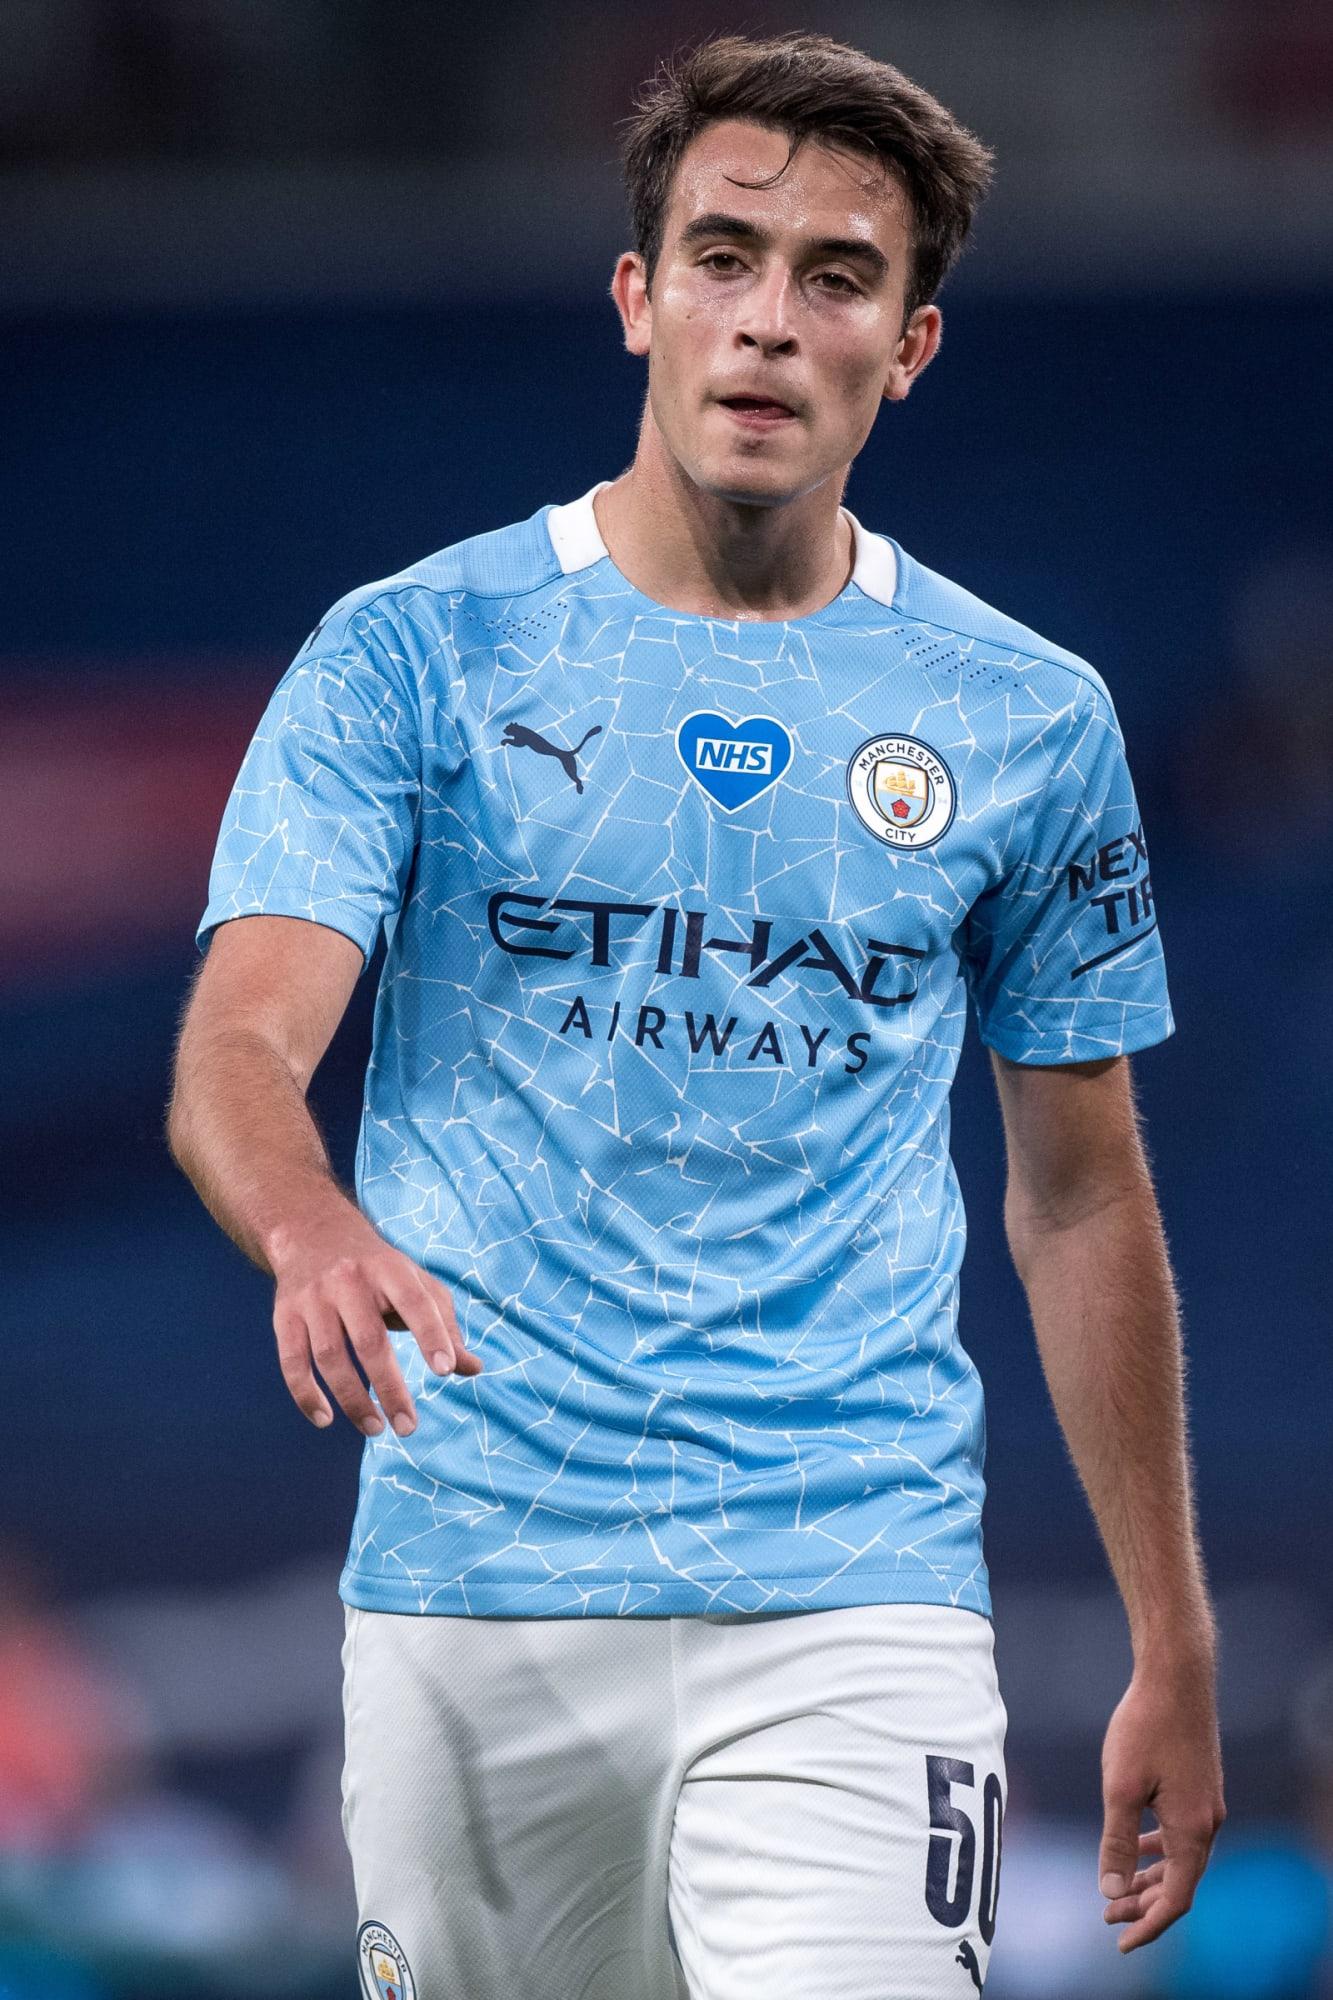 Manchester City: Eric García refuses contract extension